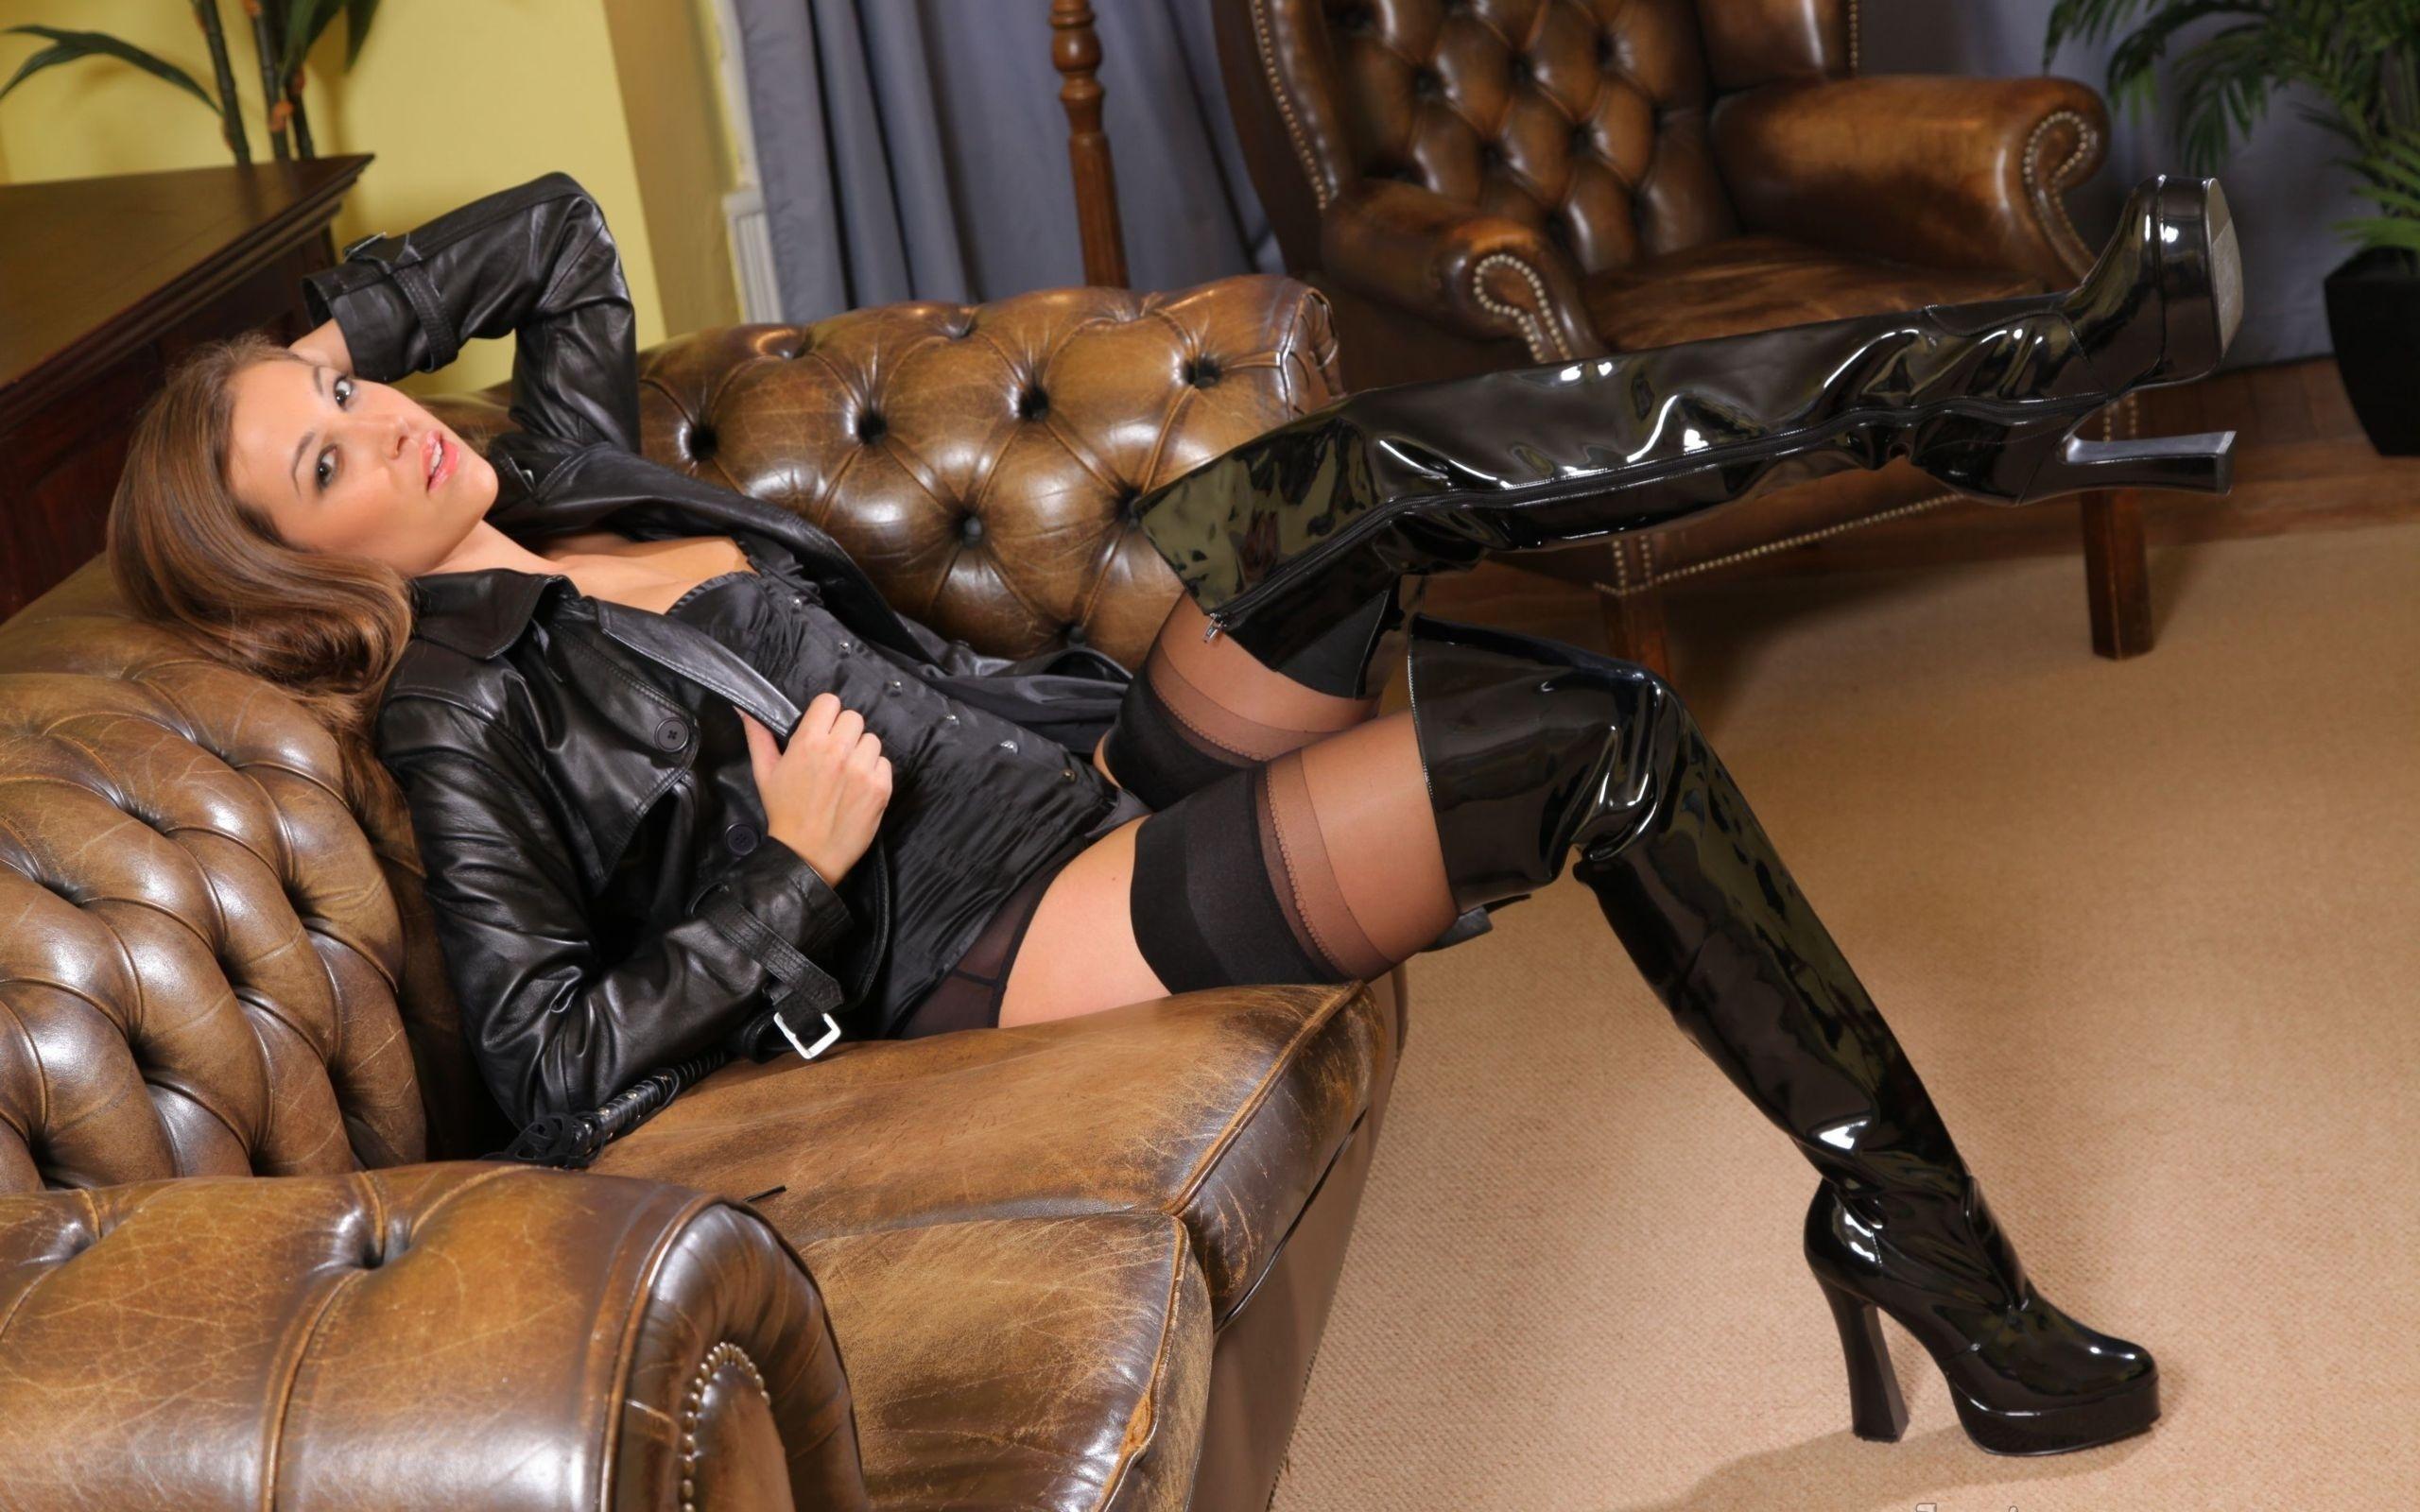 Hot chick in latex stockings Mya Diamond sucks and fucks a hard cock № 581805 без смс